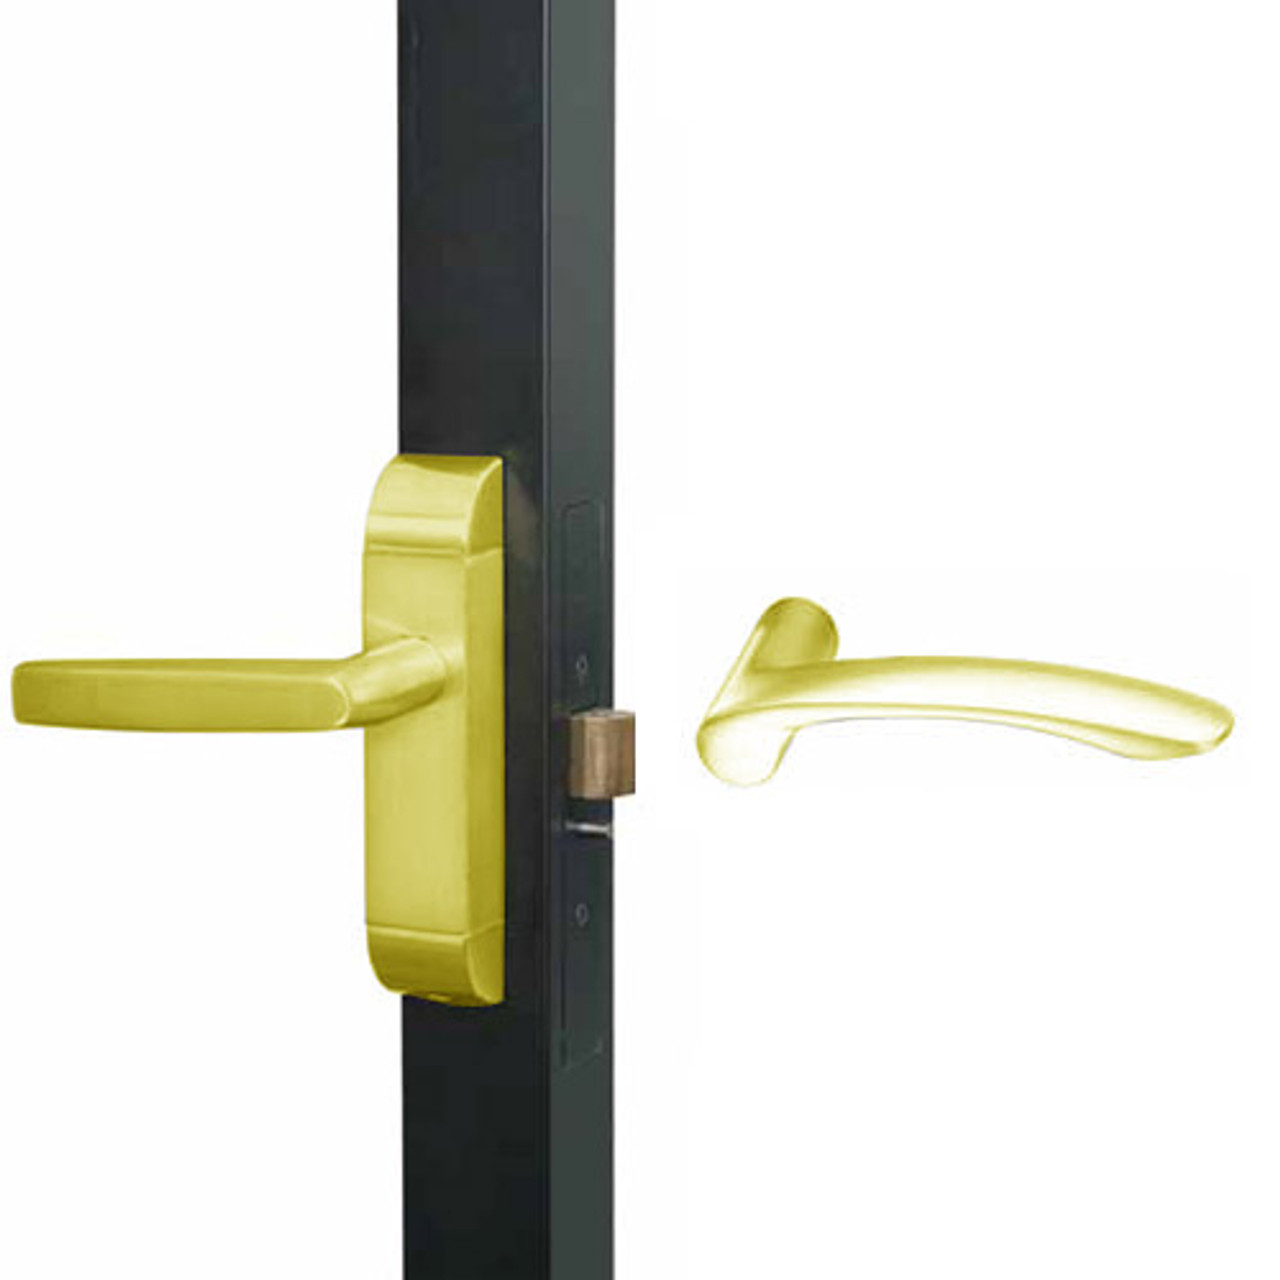 4600M-MV-531-US3 Adams Rite MV Designer Deadlatch handle in Bright Brass Finish